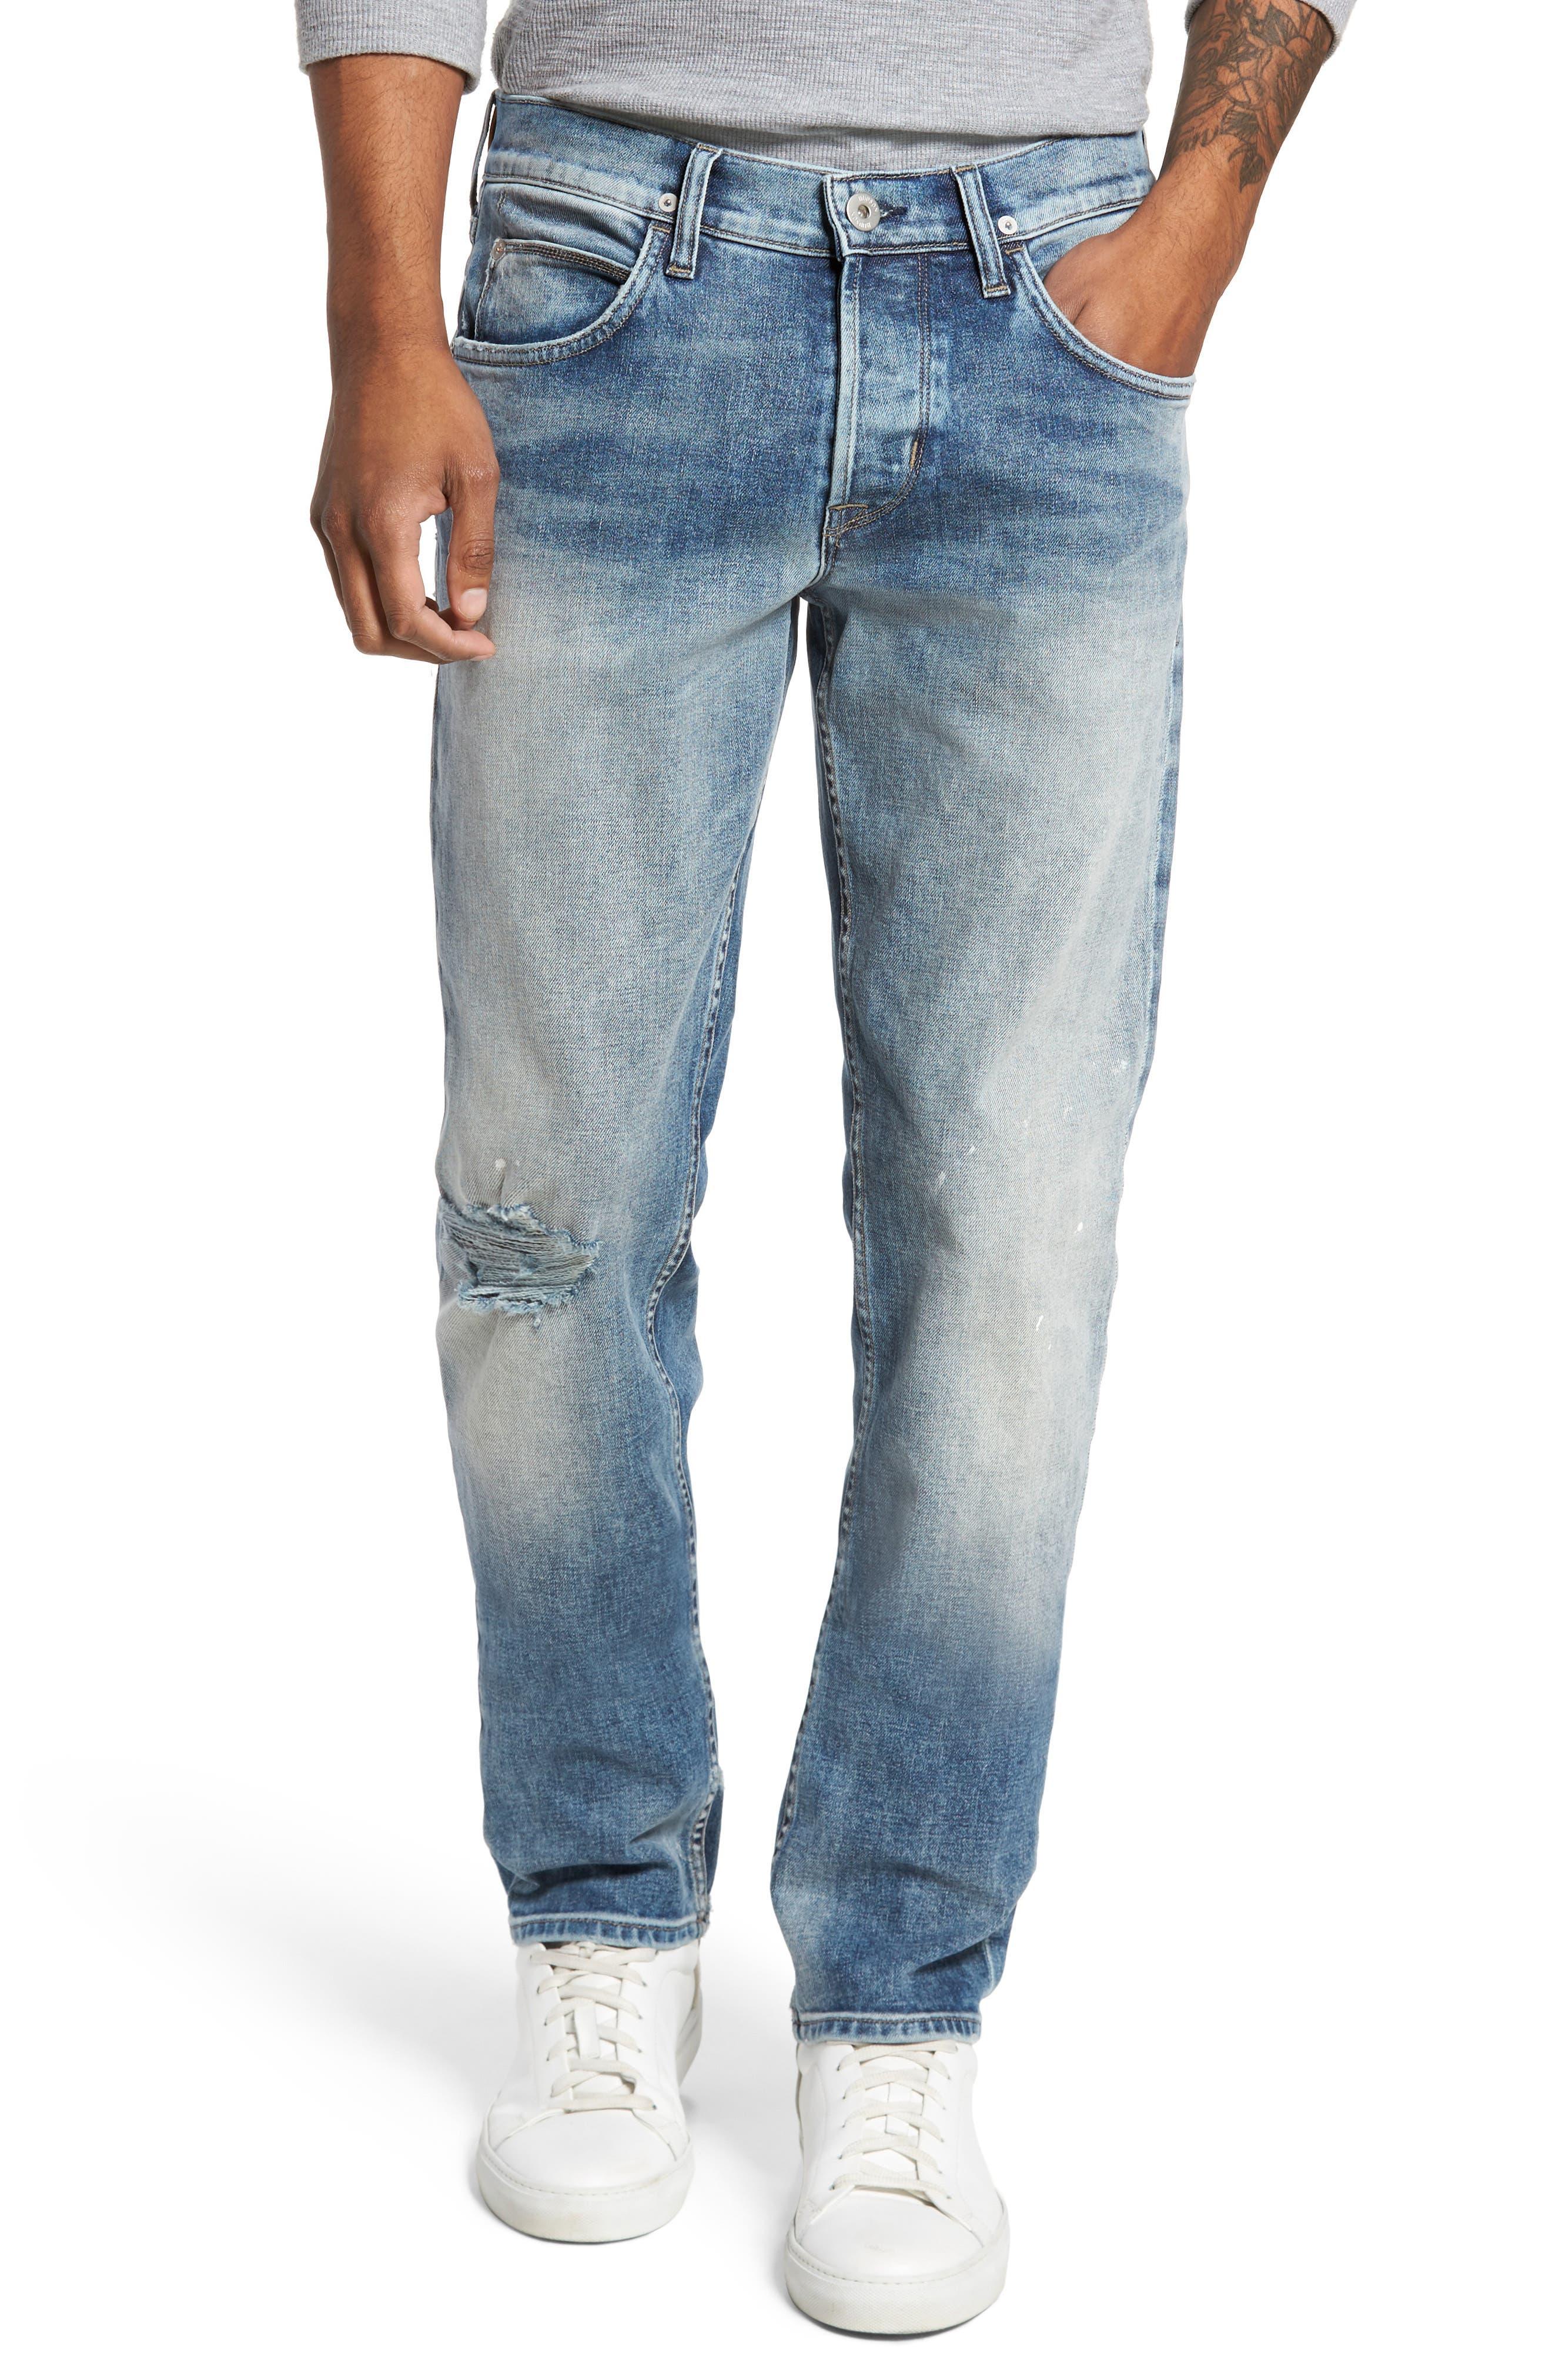 Blake Slim Fit Jeans,                         Main,                         color, Lockwood